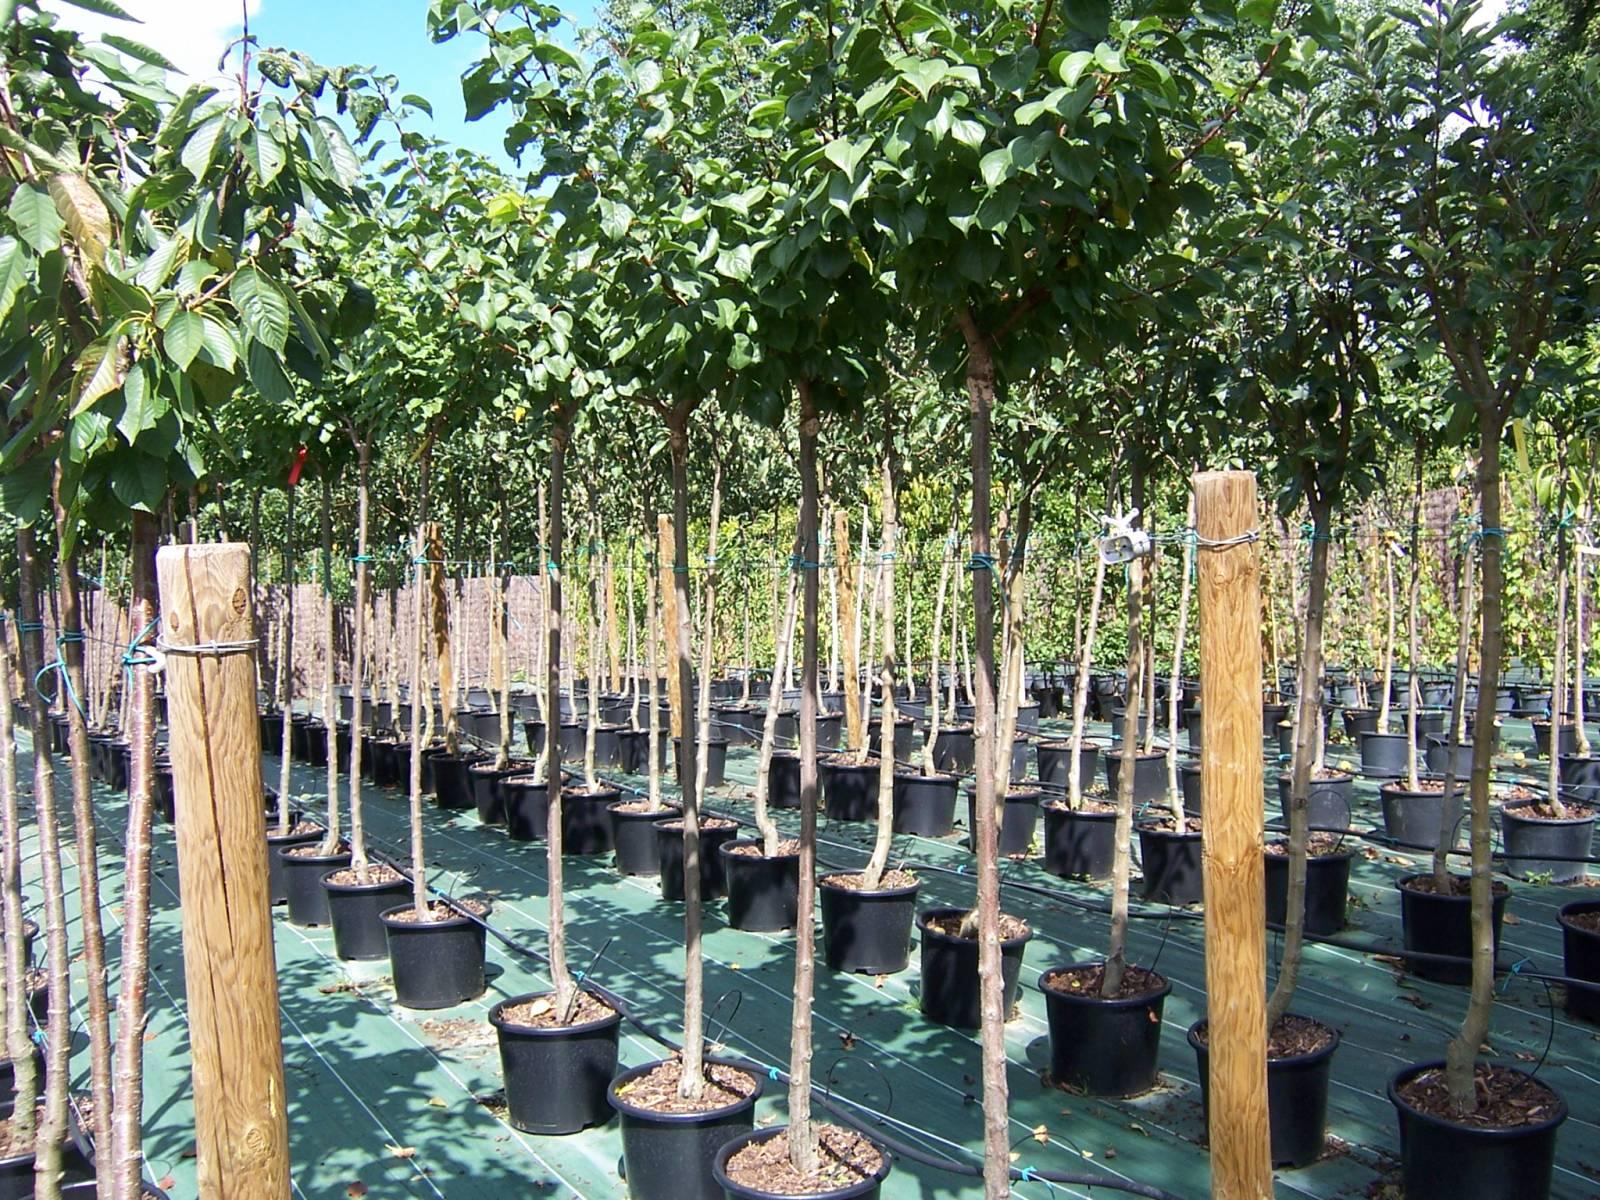 acheter arbres fruitiers en tige libourne p pini re saint sulpice et cameyrac arbres. Black Bedroom Furniture Sets. Home Design Ideas